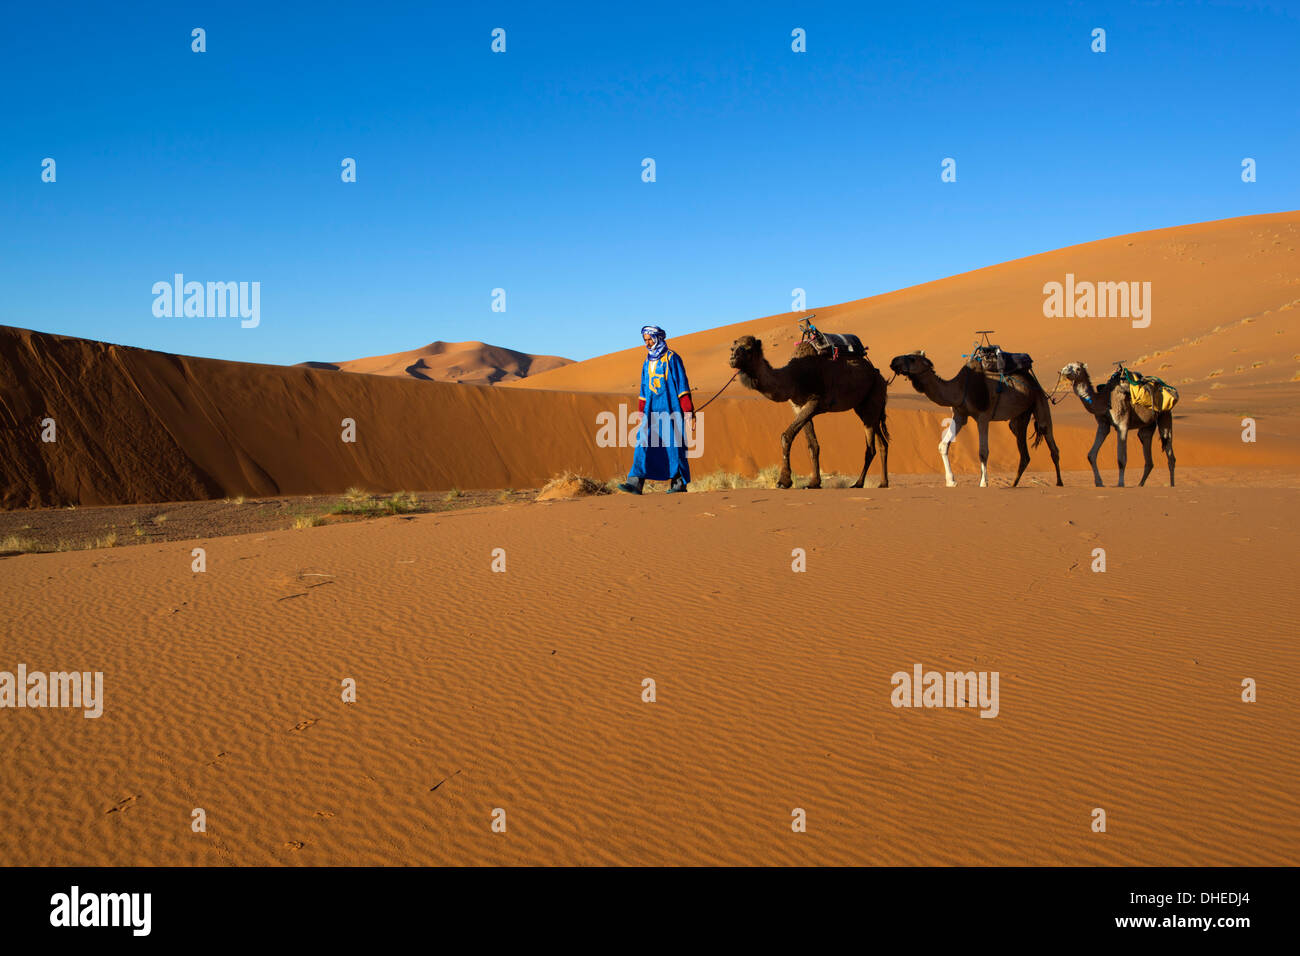 Moroccan camel driver, Dunes of Erg Chebbi, Merzouga, Meknes-Tafilalet, Morocco, North Africa, Africa - Stock Image